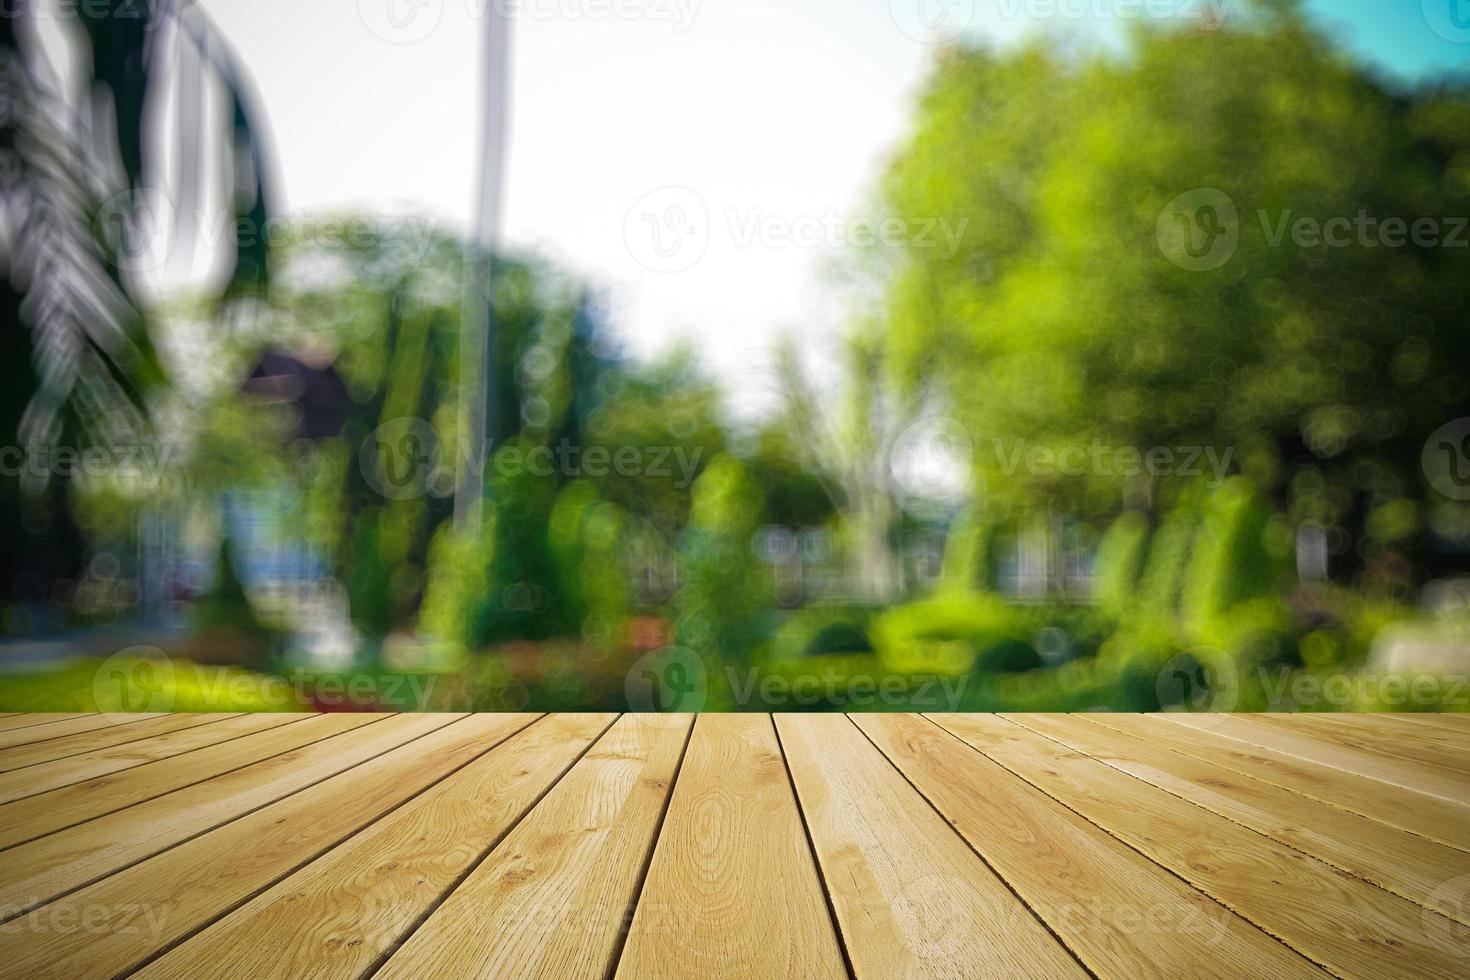 perspectief hout en bokeh lichte achtergrond foto